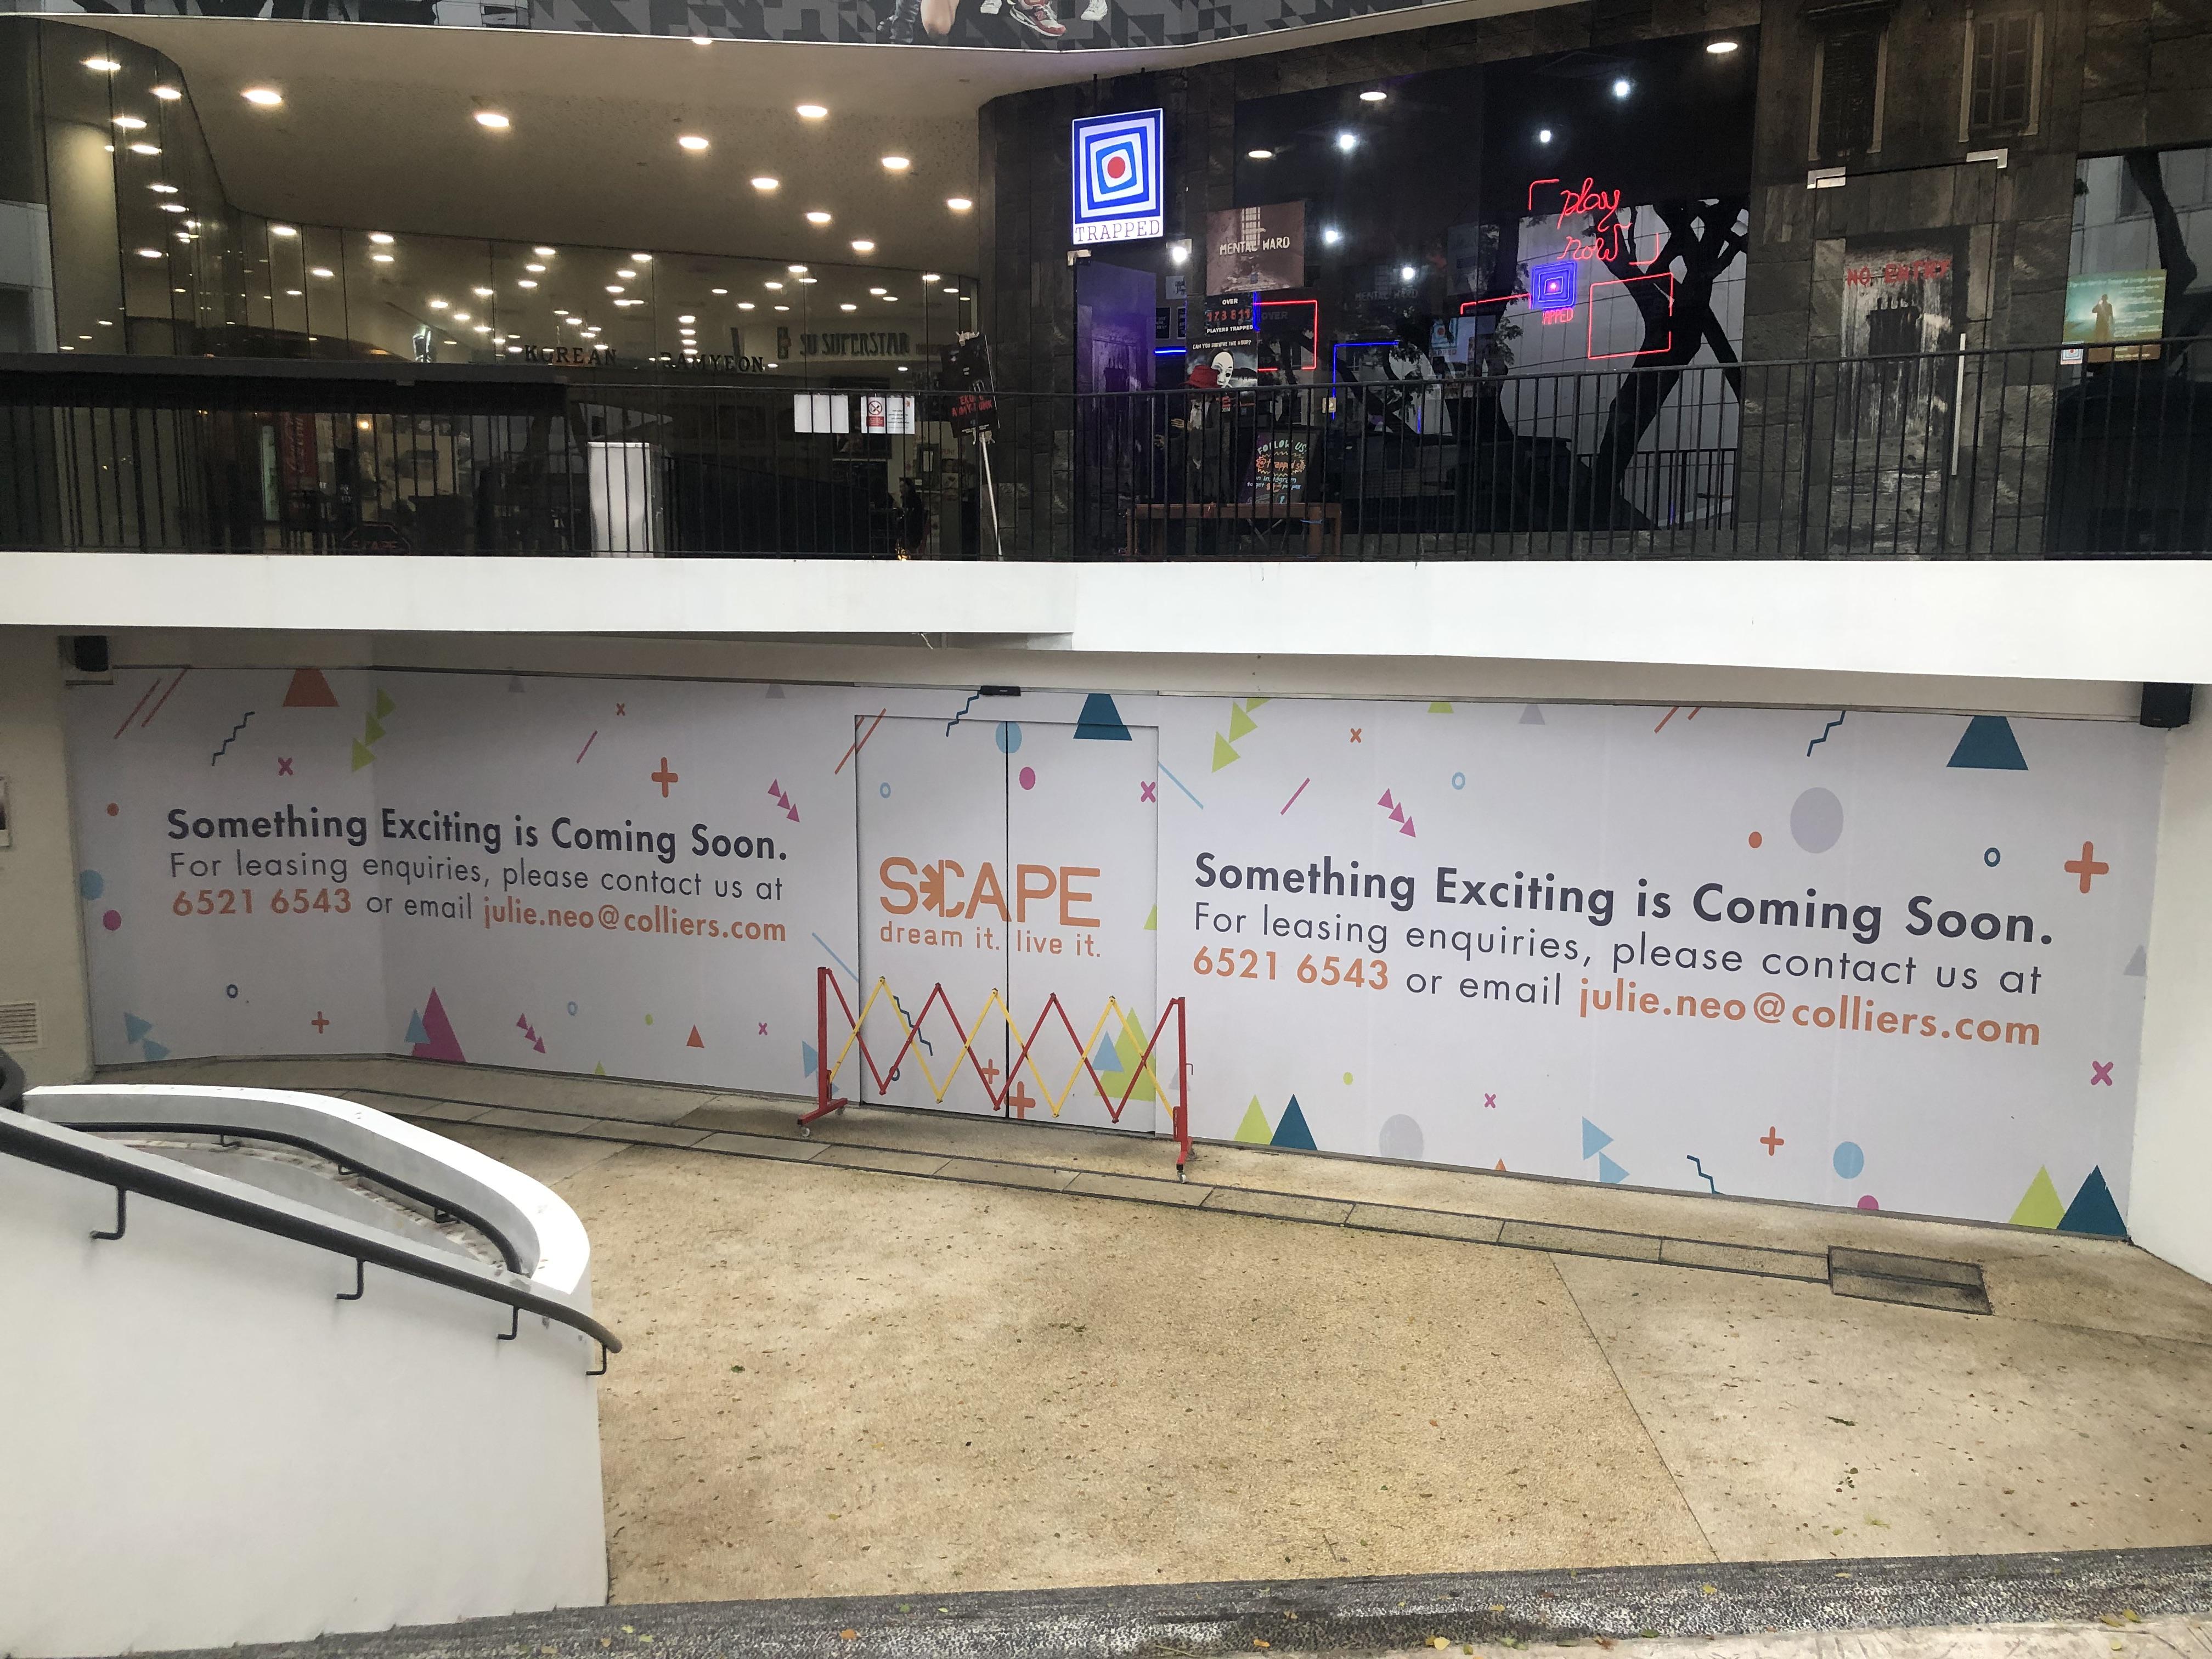 Exterior of *SCAPE underground undergoing upgrading